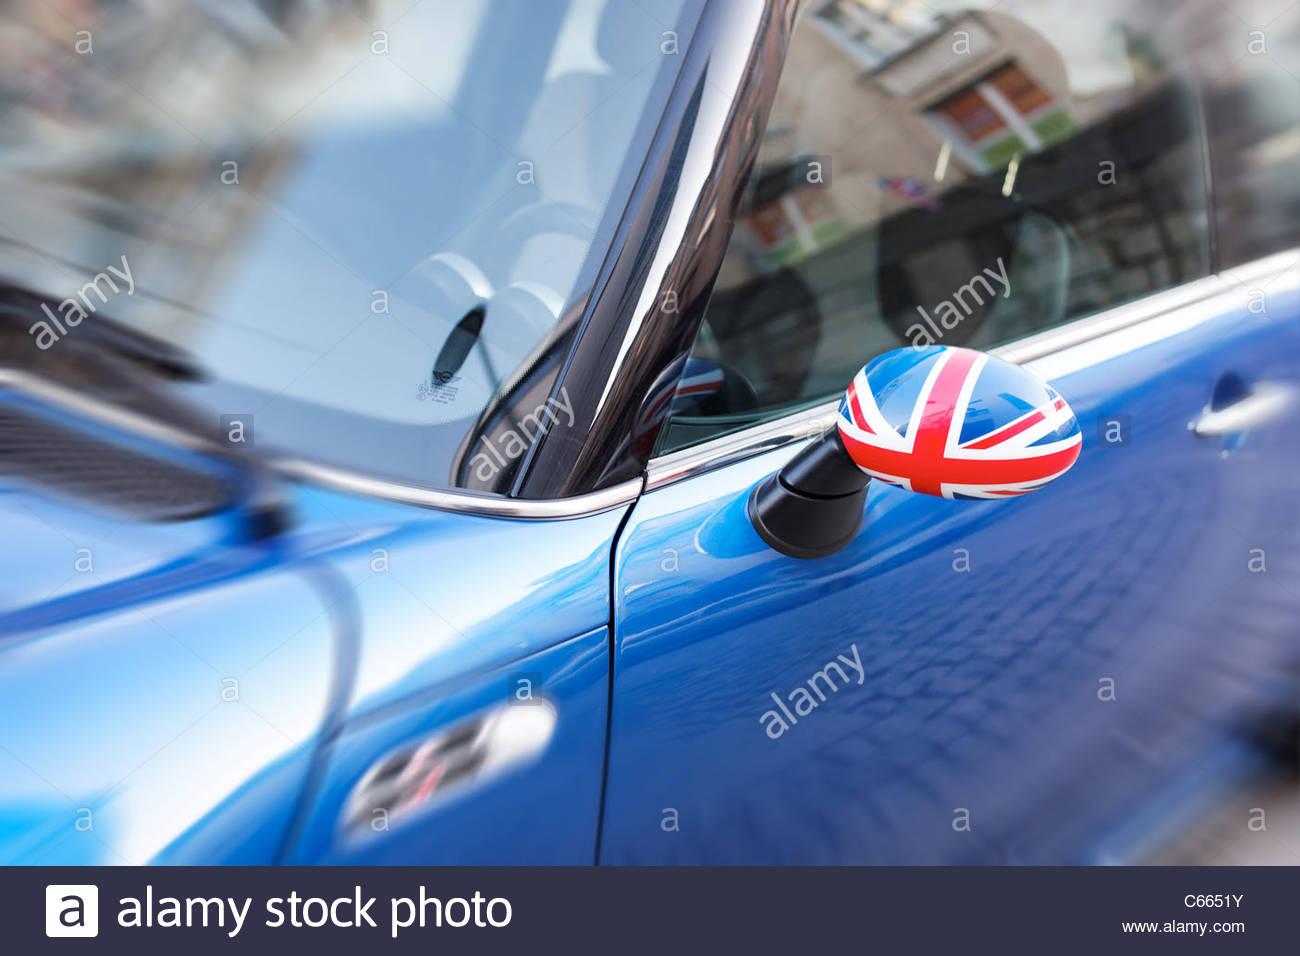 British Patriotism shown on car mirror - Stock Image